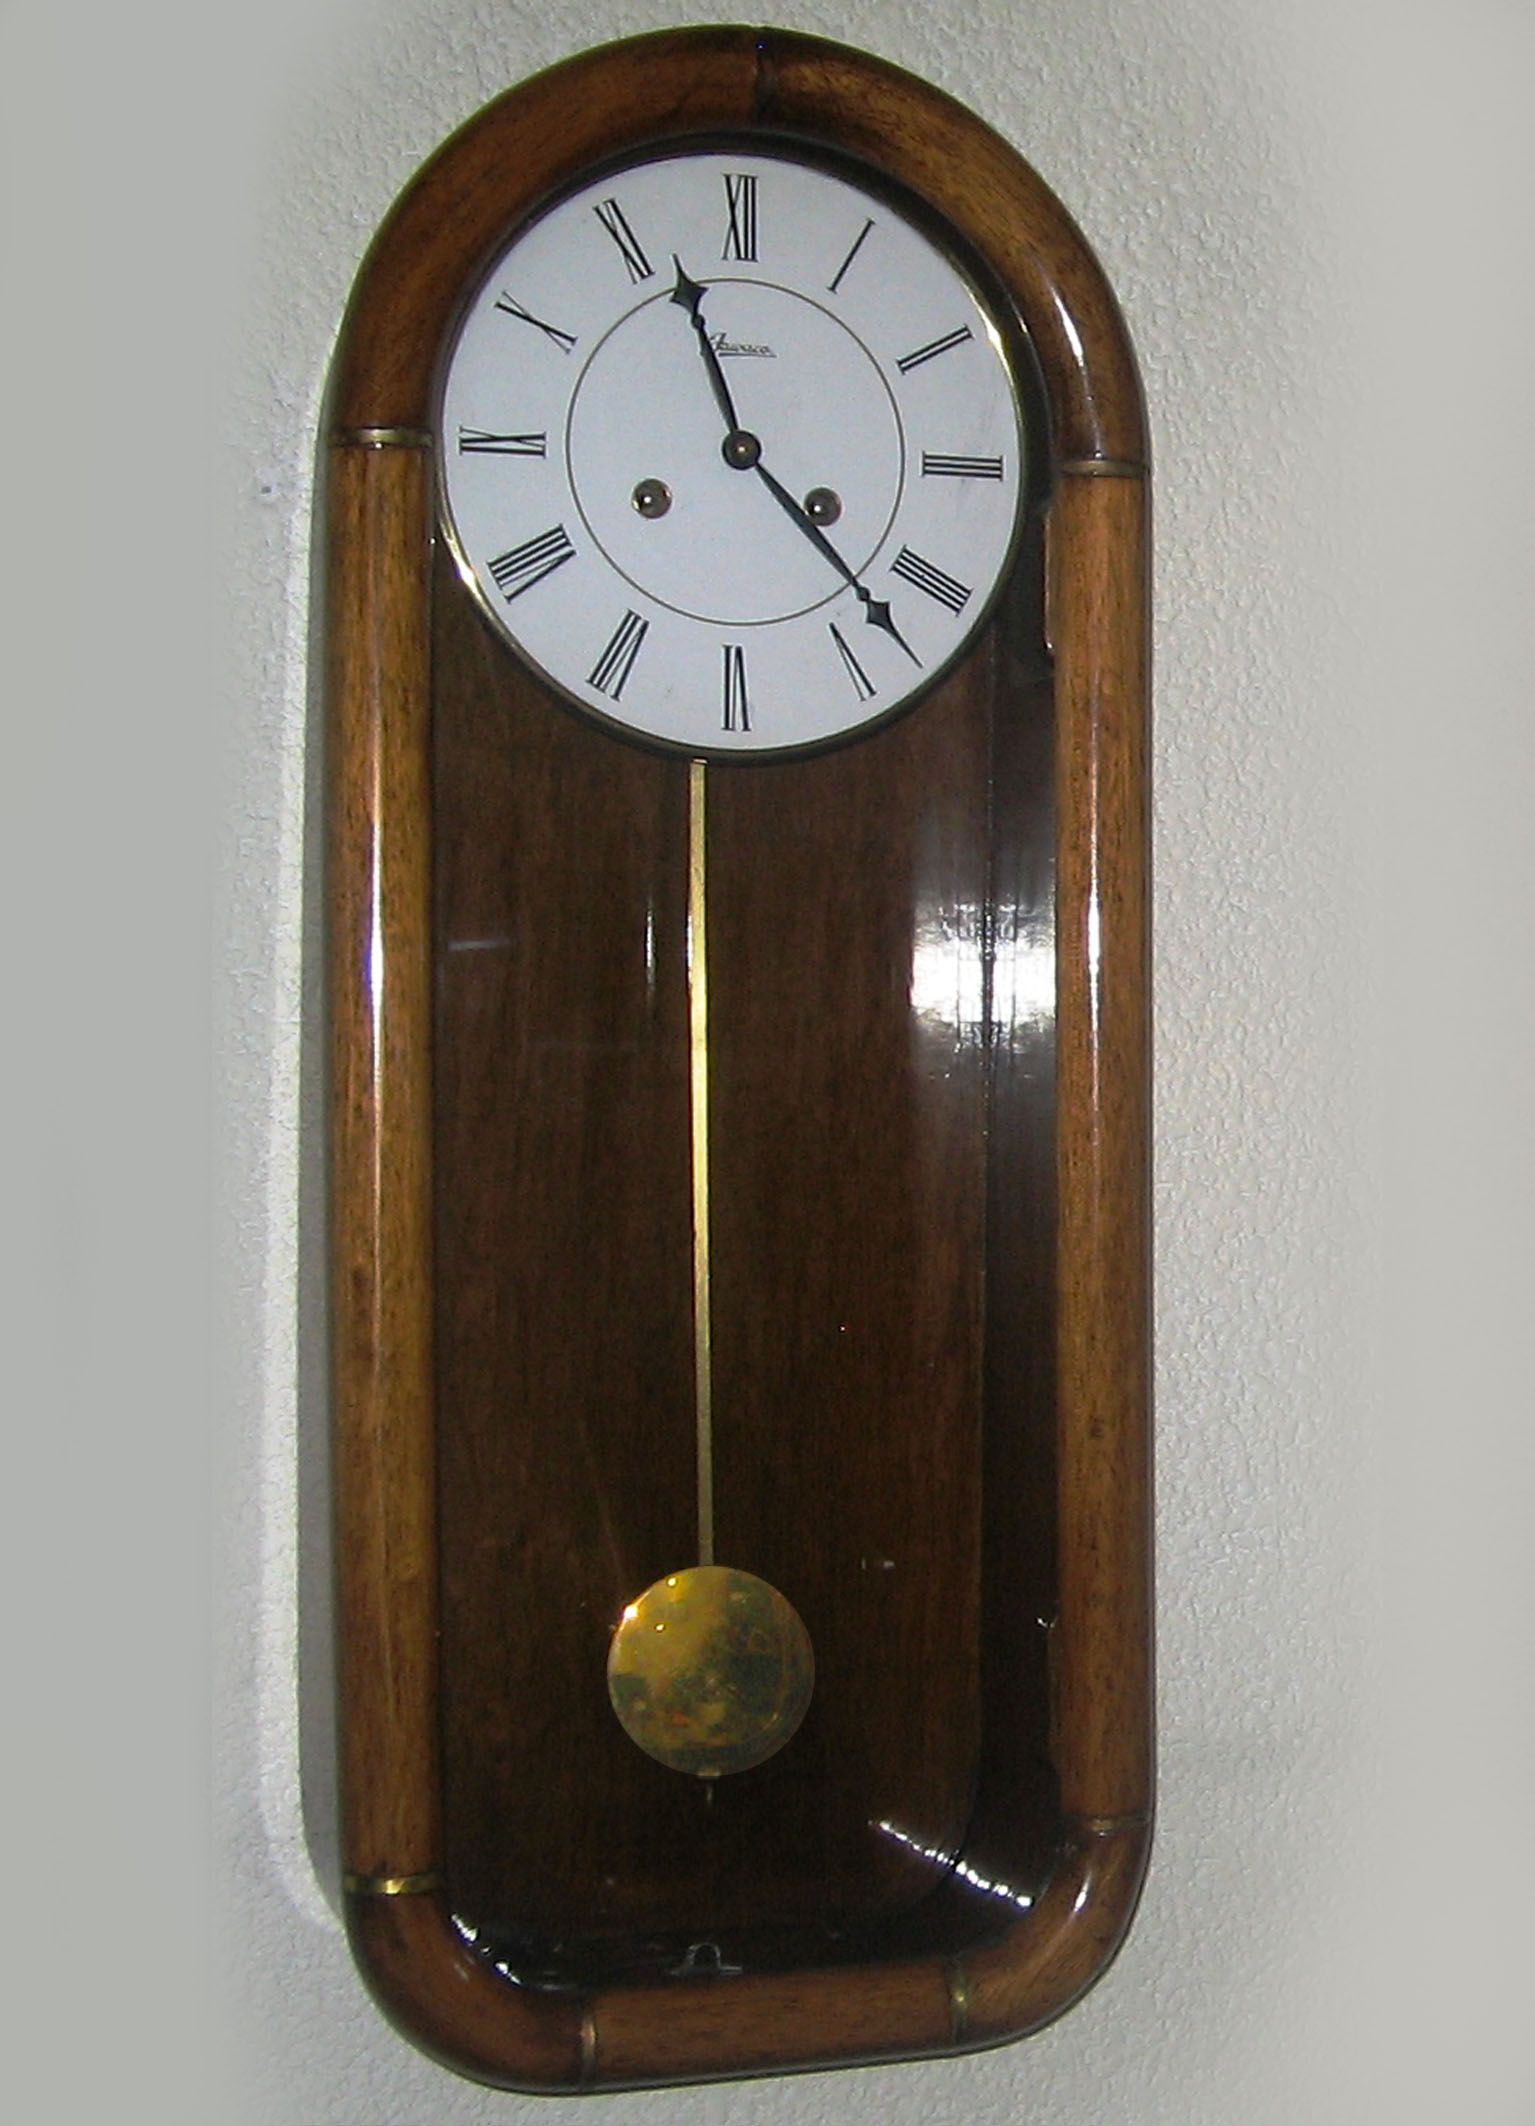 Fotos de relojes antiguos buscar con google reloj de - Relojes antiguos de mesa ...